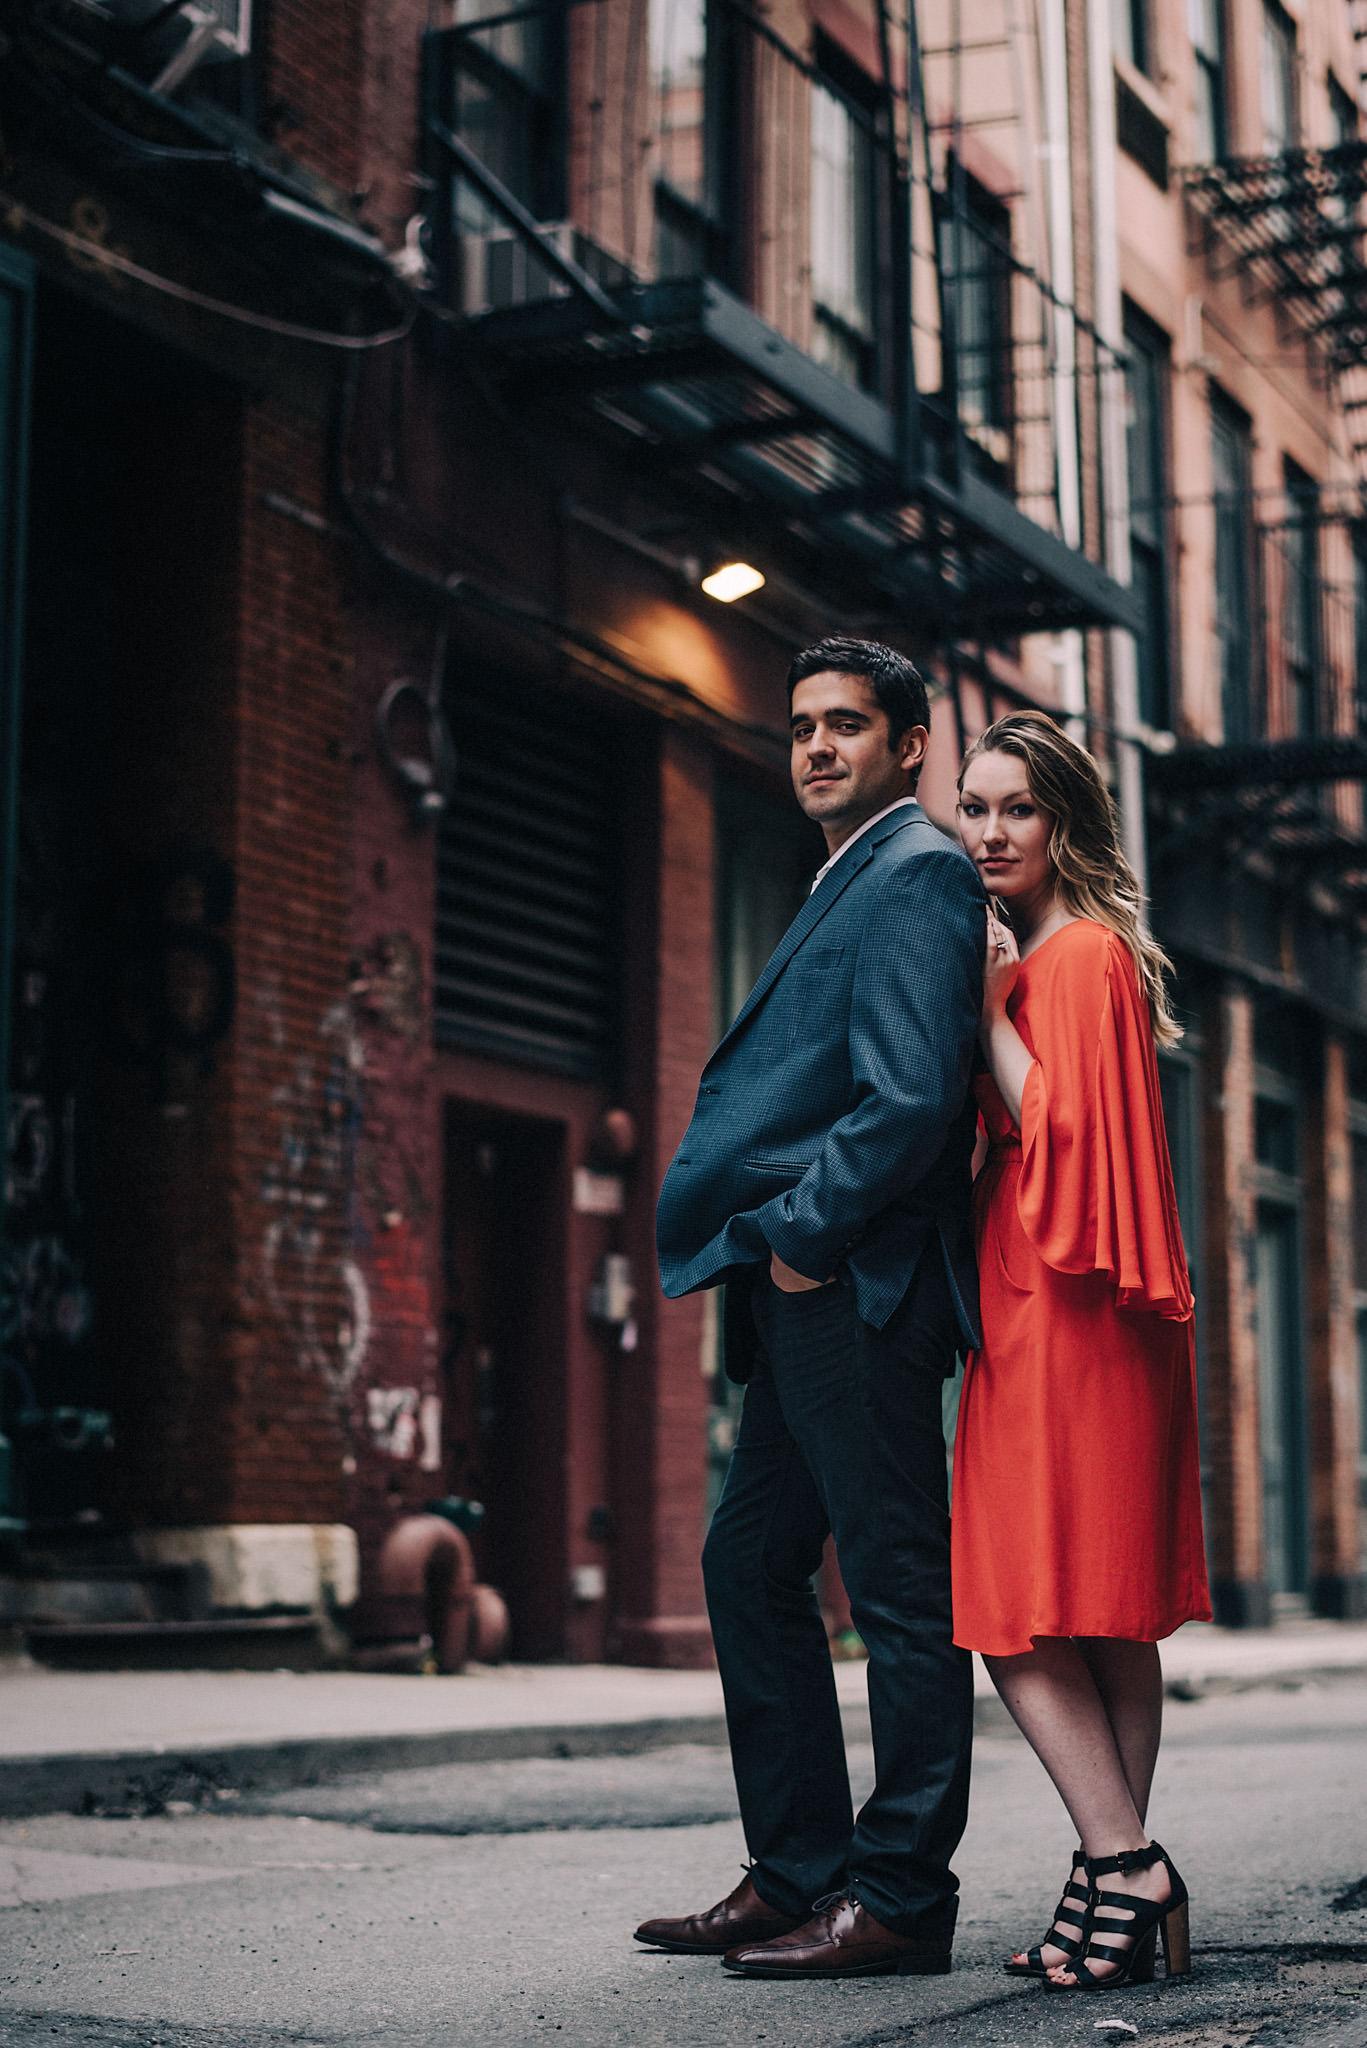 New-York-Photographer-Engagement-Felipe-Carranza-26